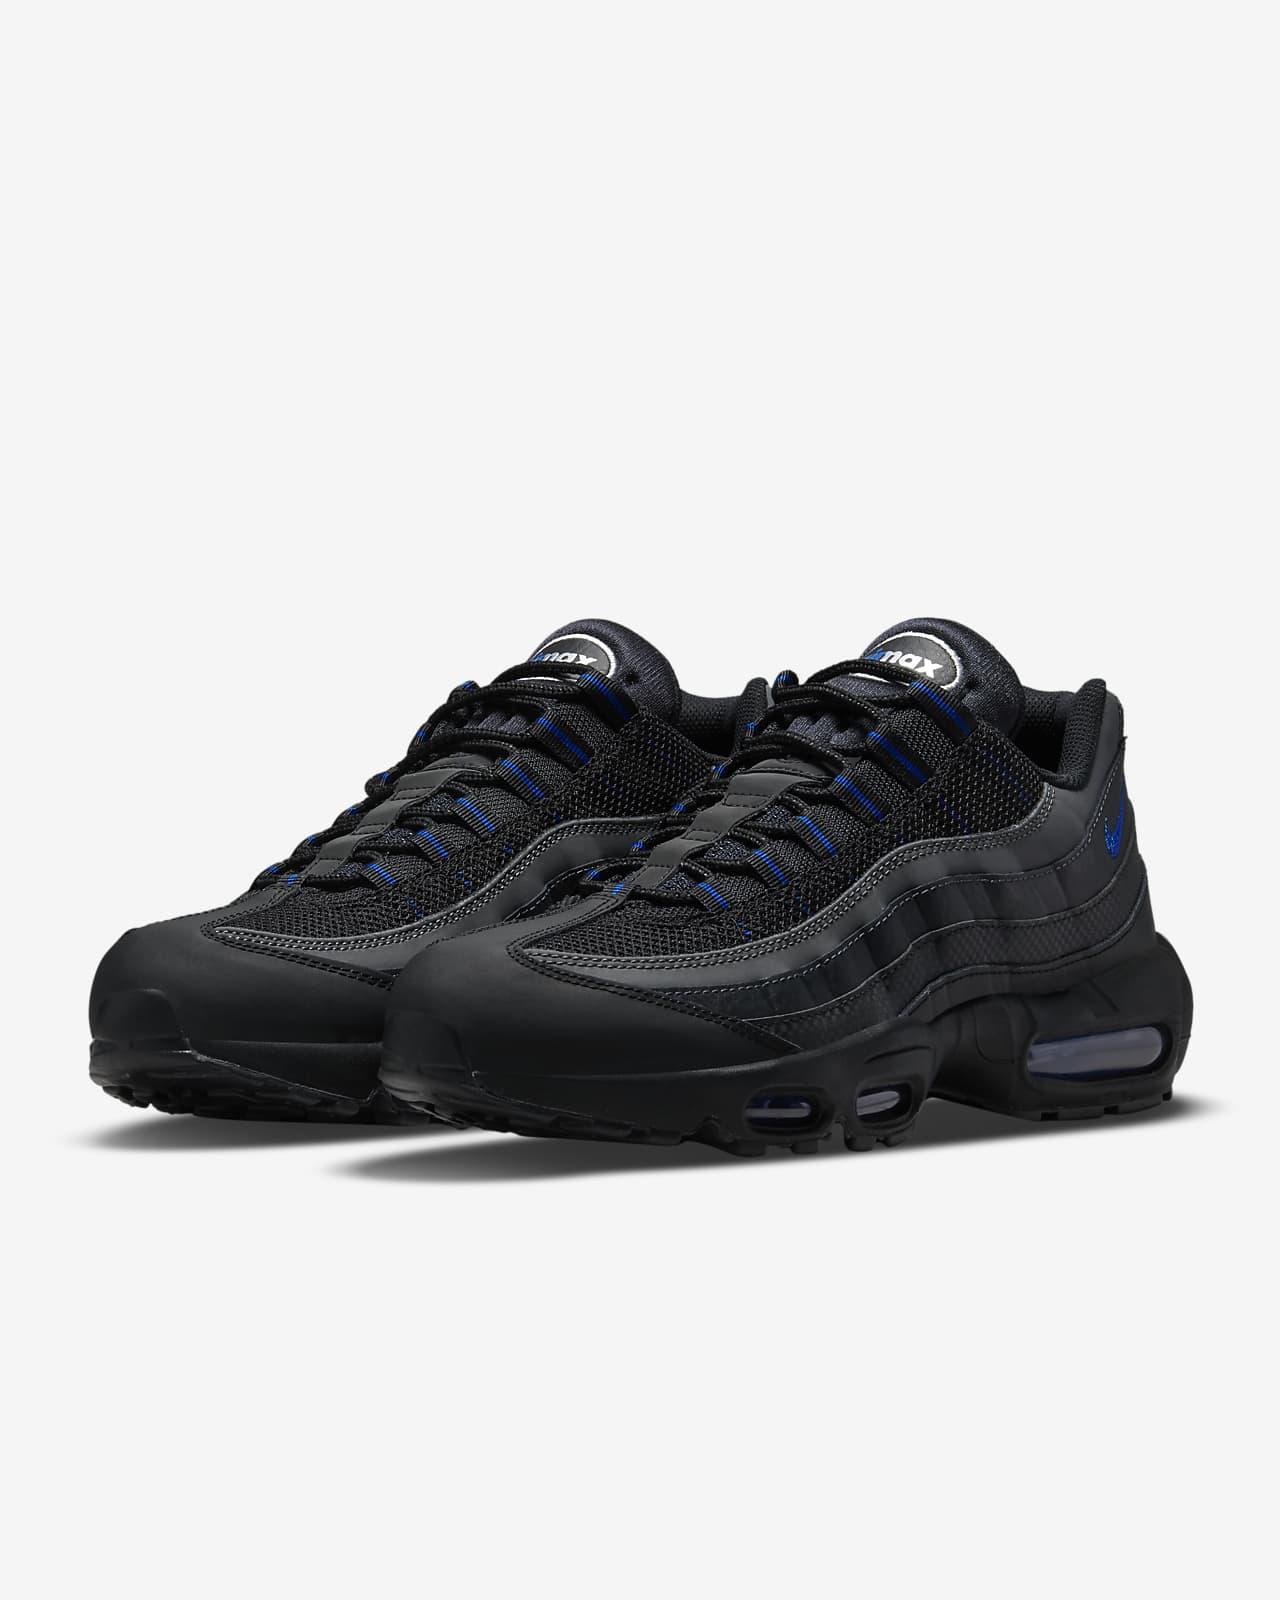 Nike Air Max 95 Essential Men's Shoes. Nike LU